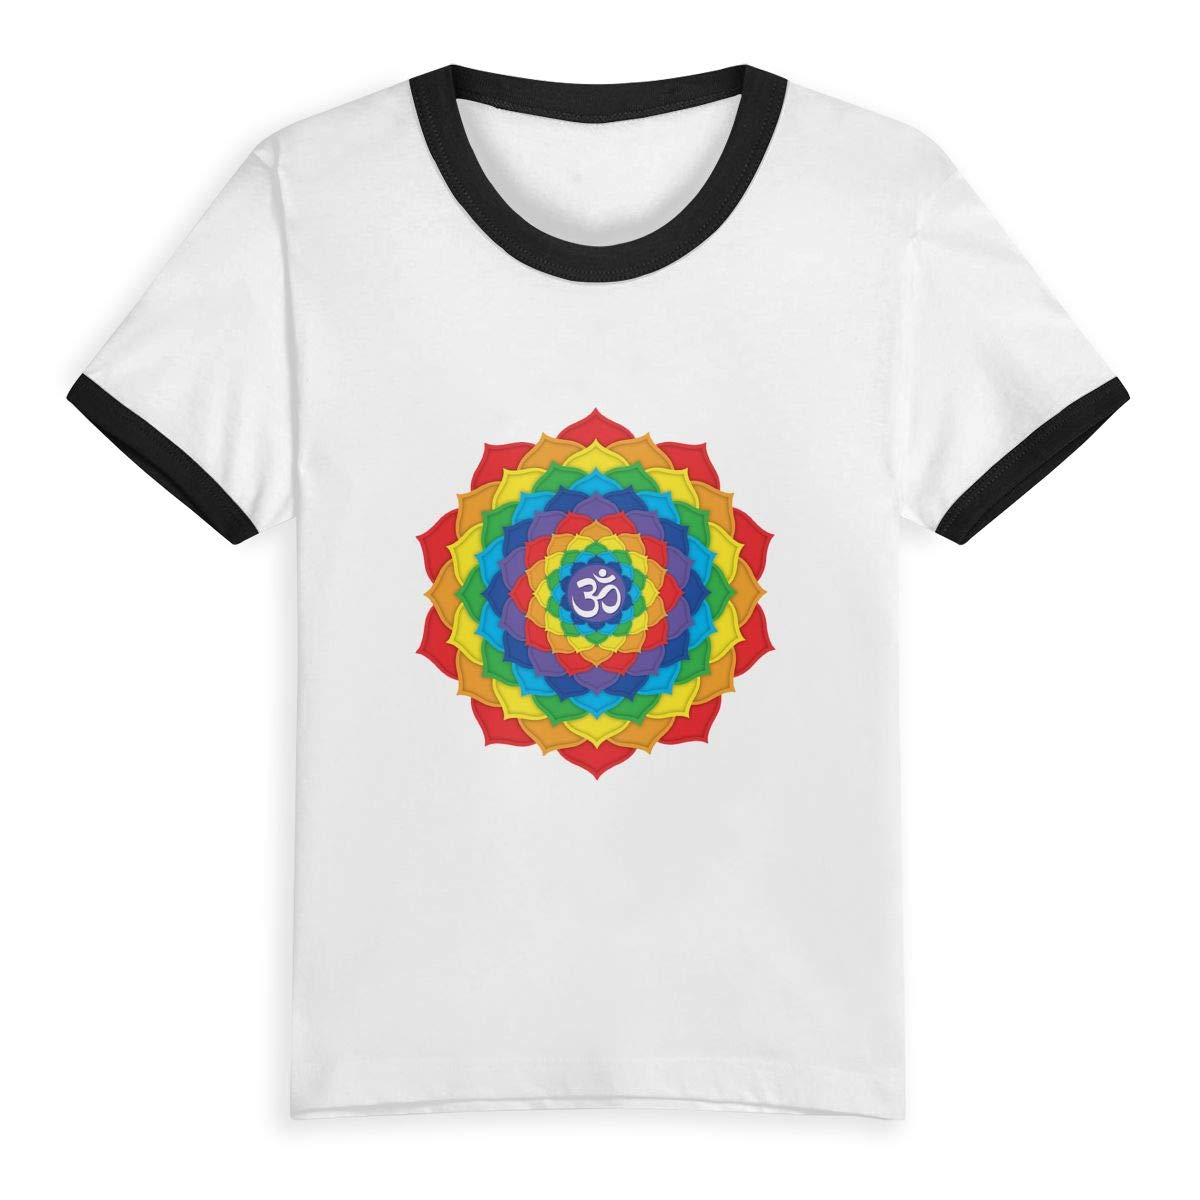 Kids T-Shirt Tops Rainbow Crown Chakra Unisex Youths Short Sleeve T-Shirt